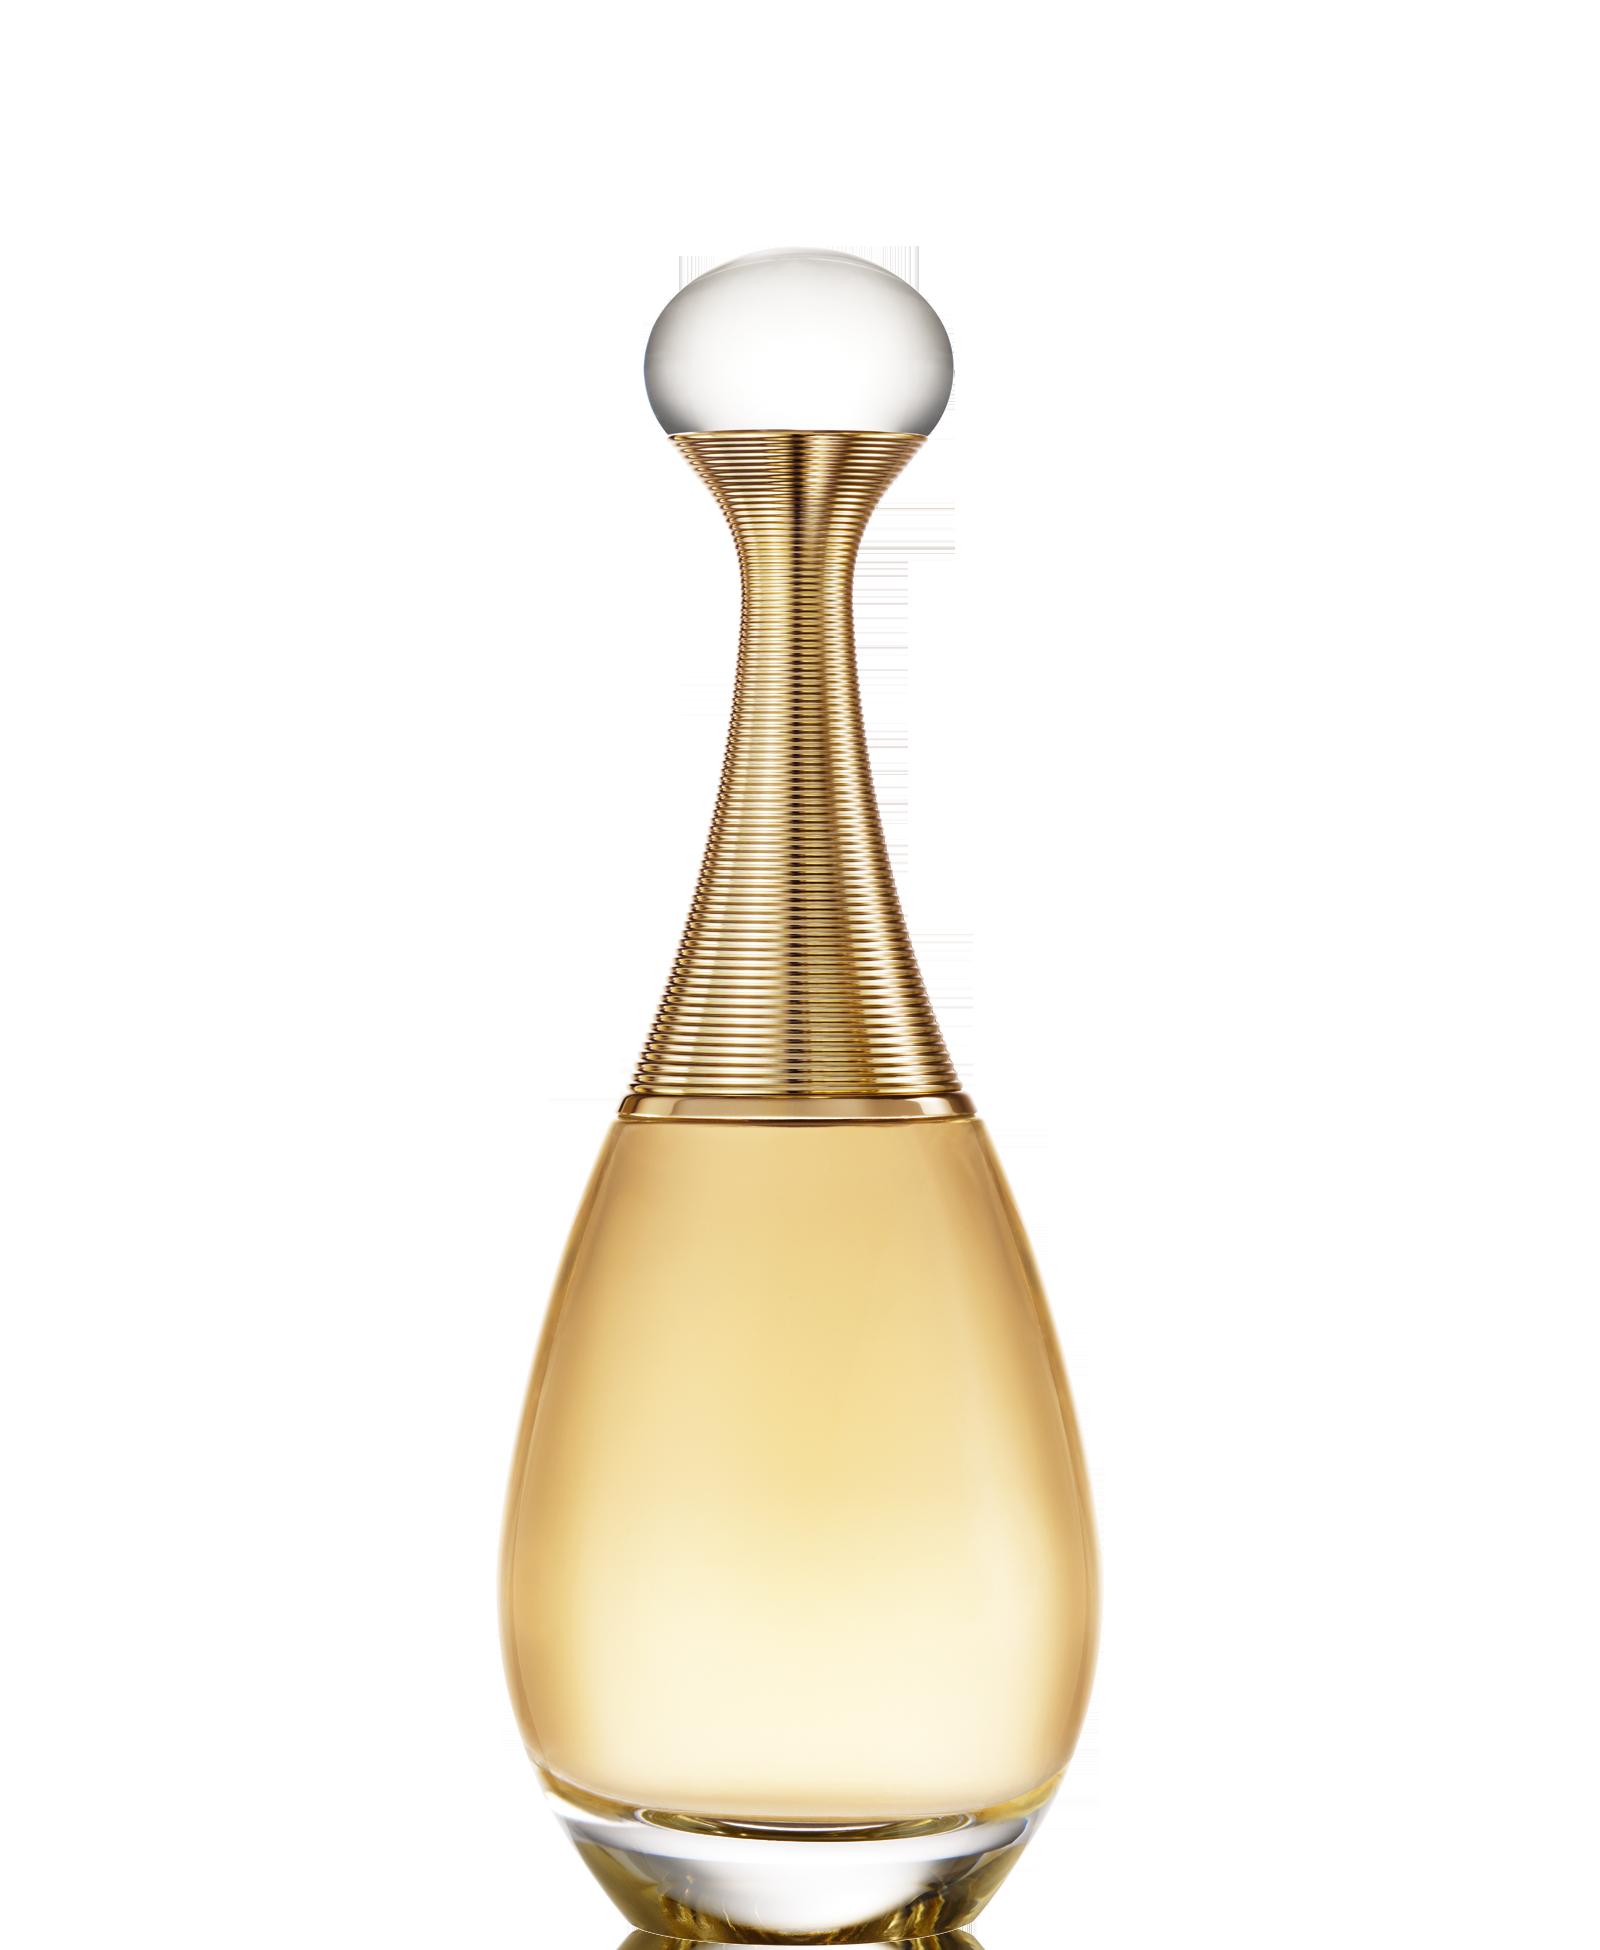 FOTO: Dior J'Adore Eau de Parfum (verskaf)